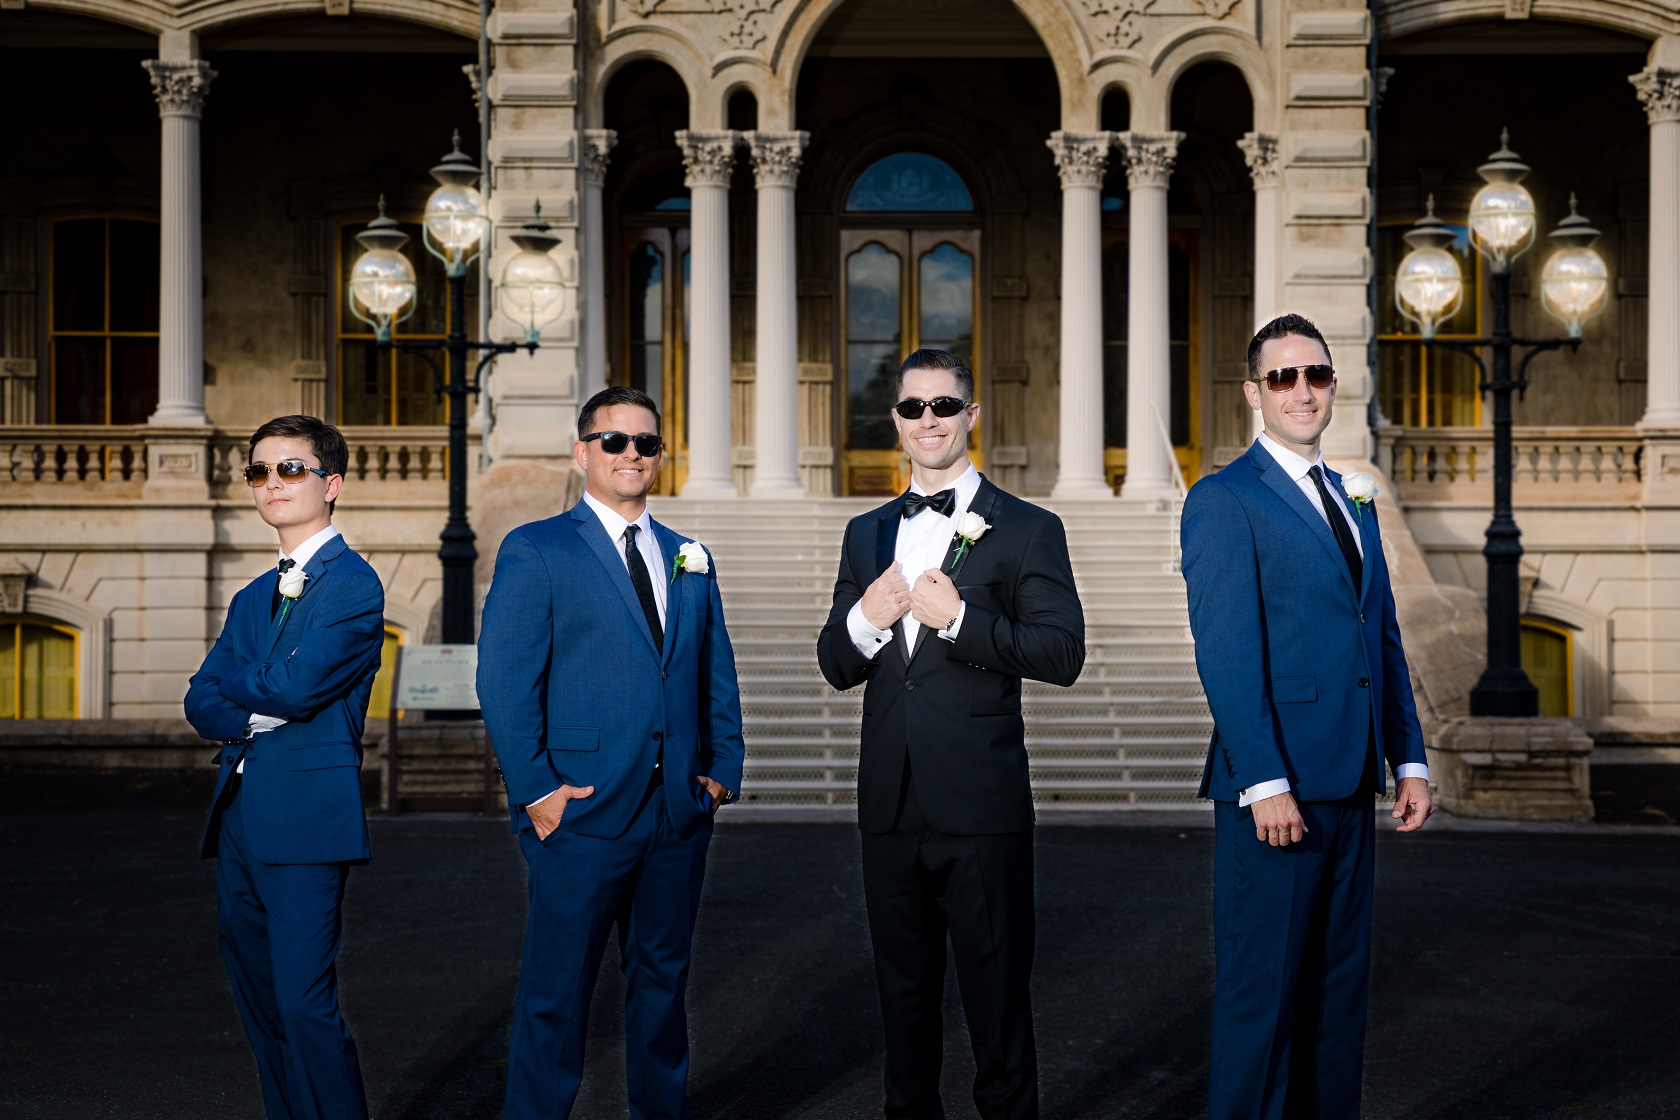 groomsmens wedding ceremony portraits oahu hawaii